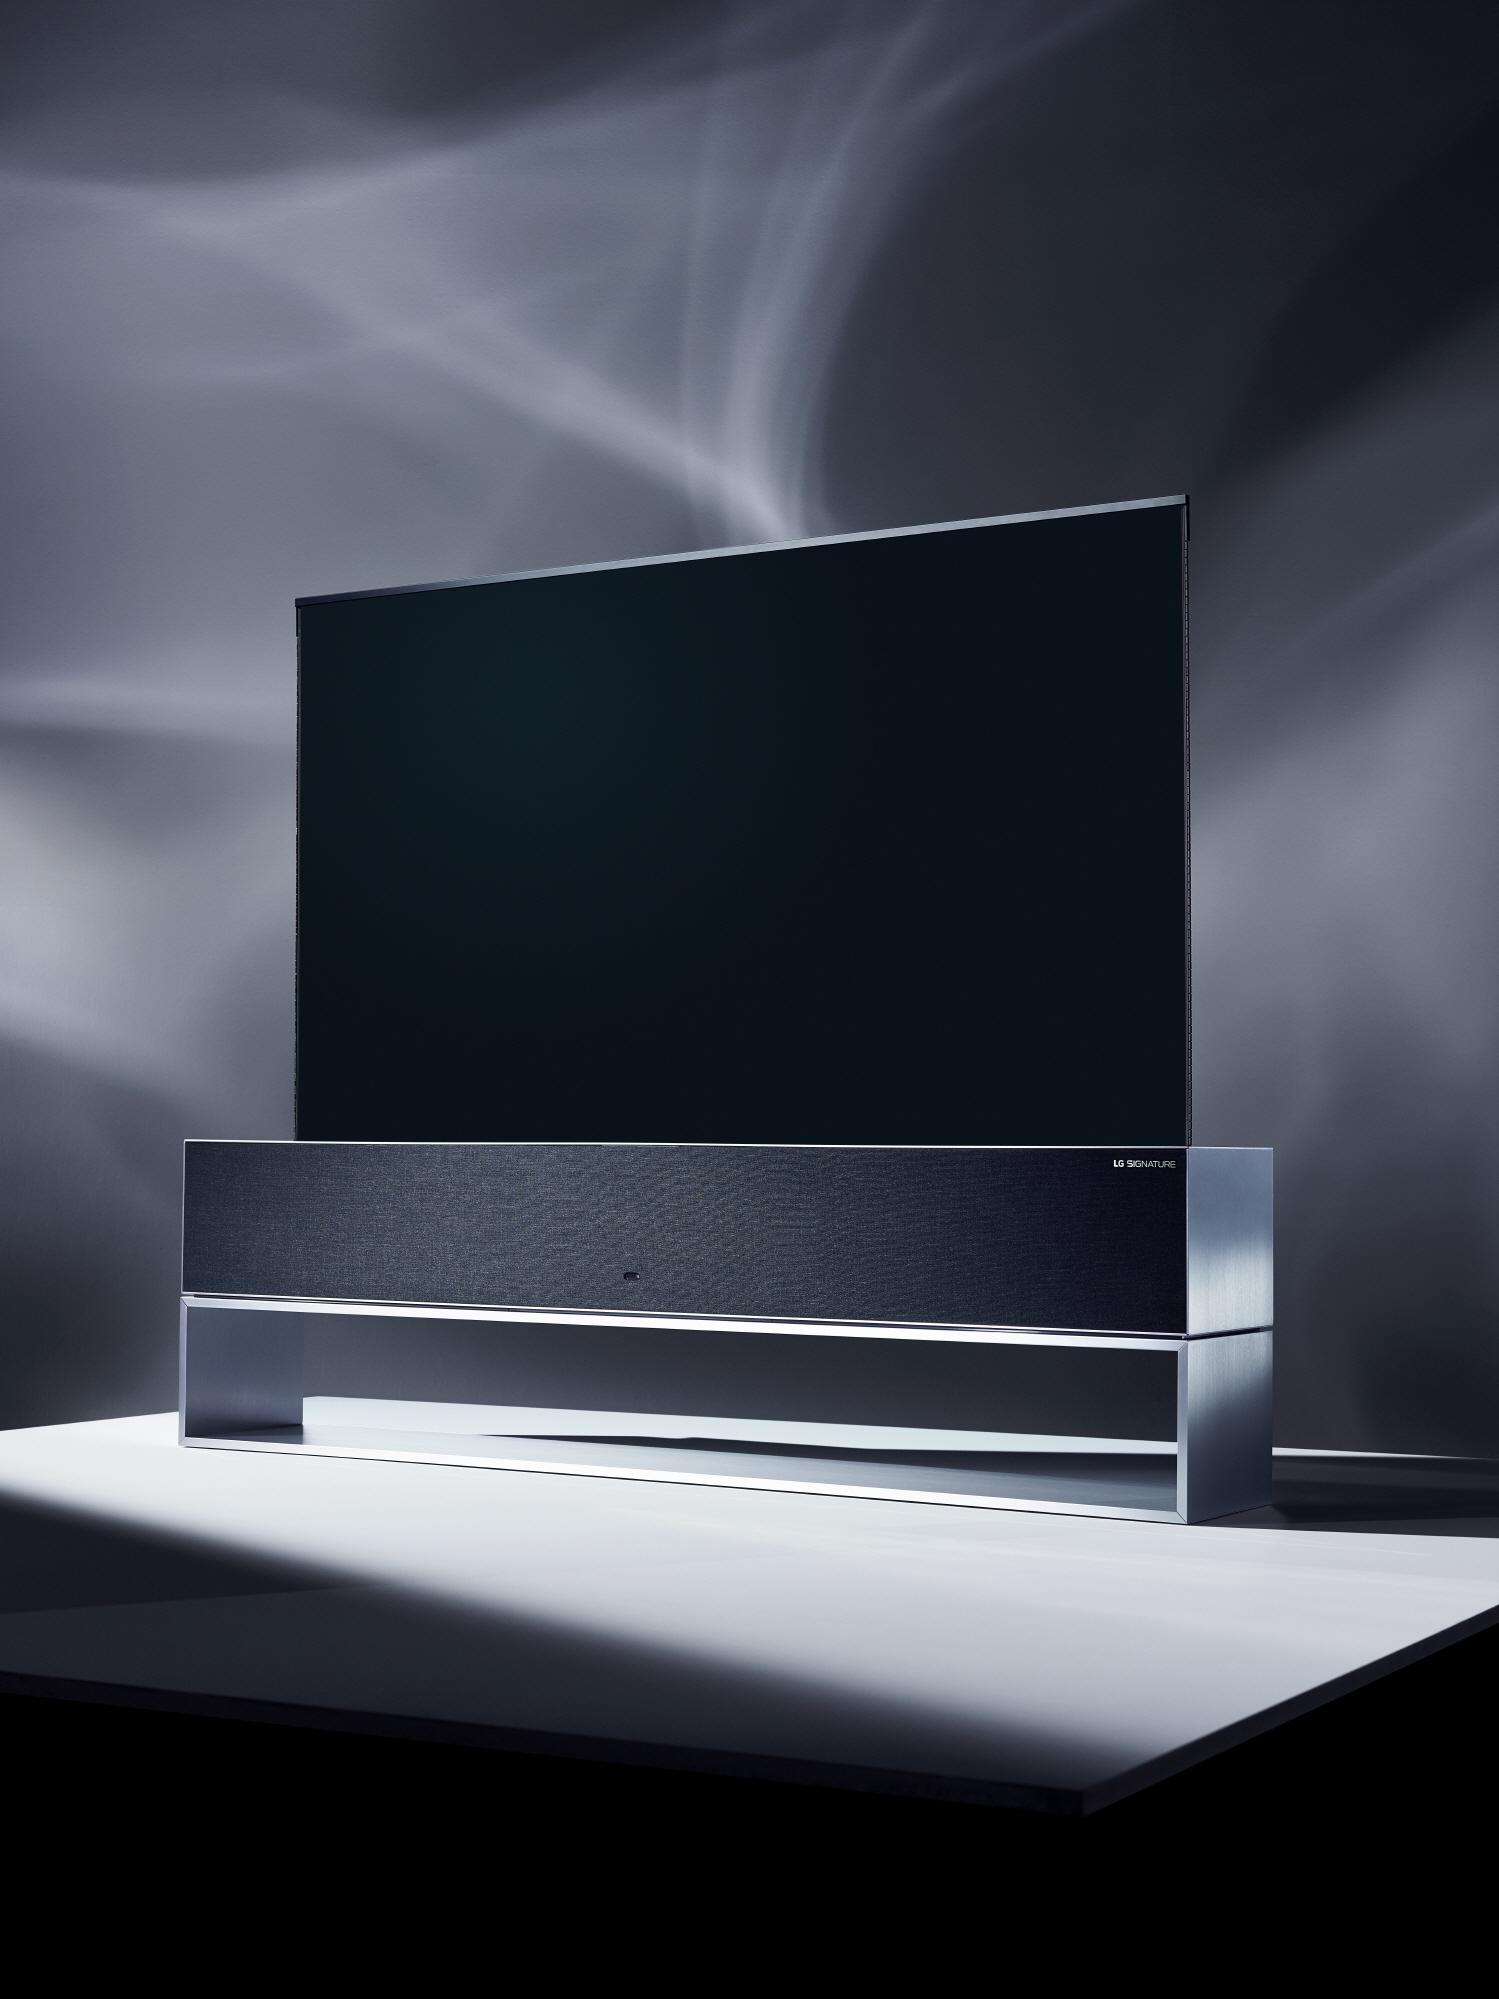 LG OLED TV R Product 02